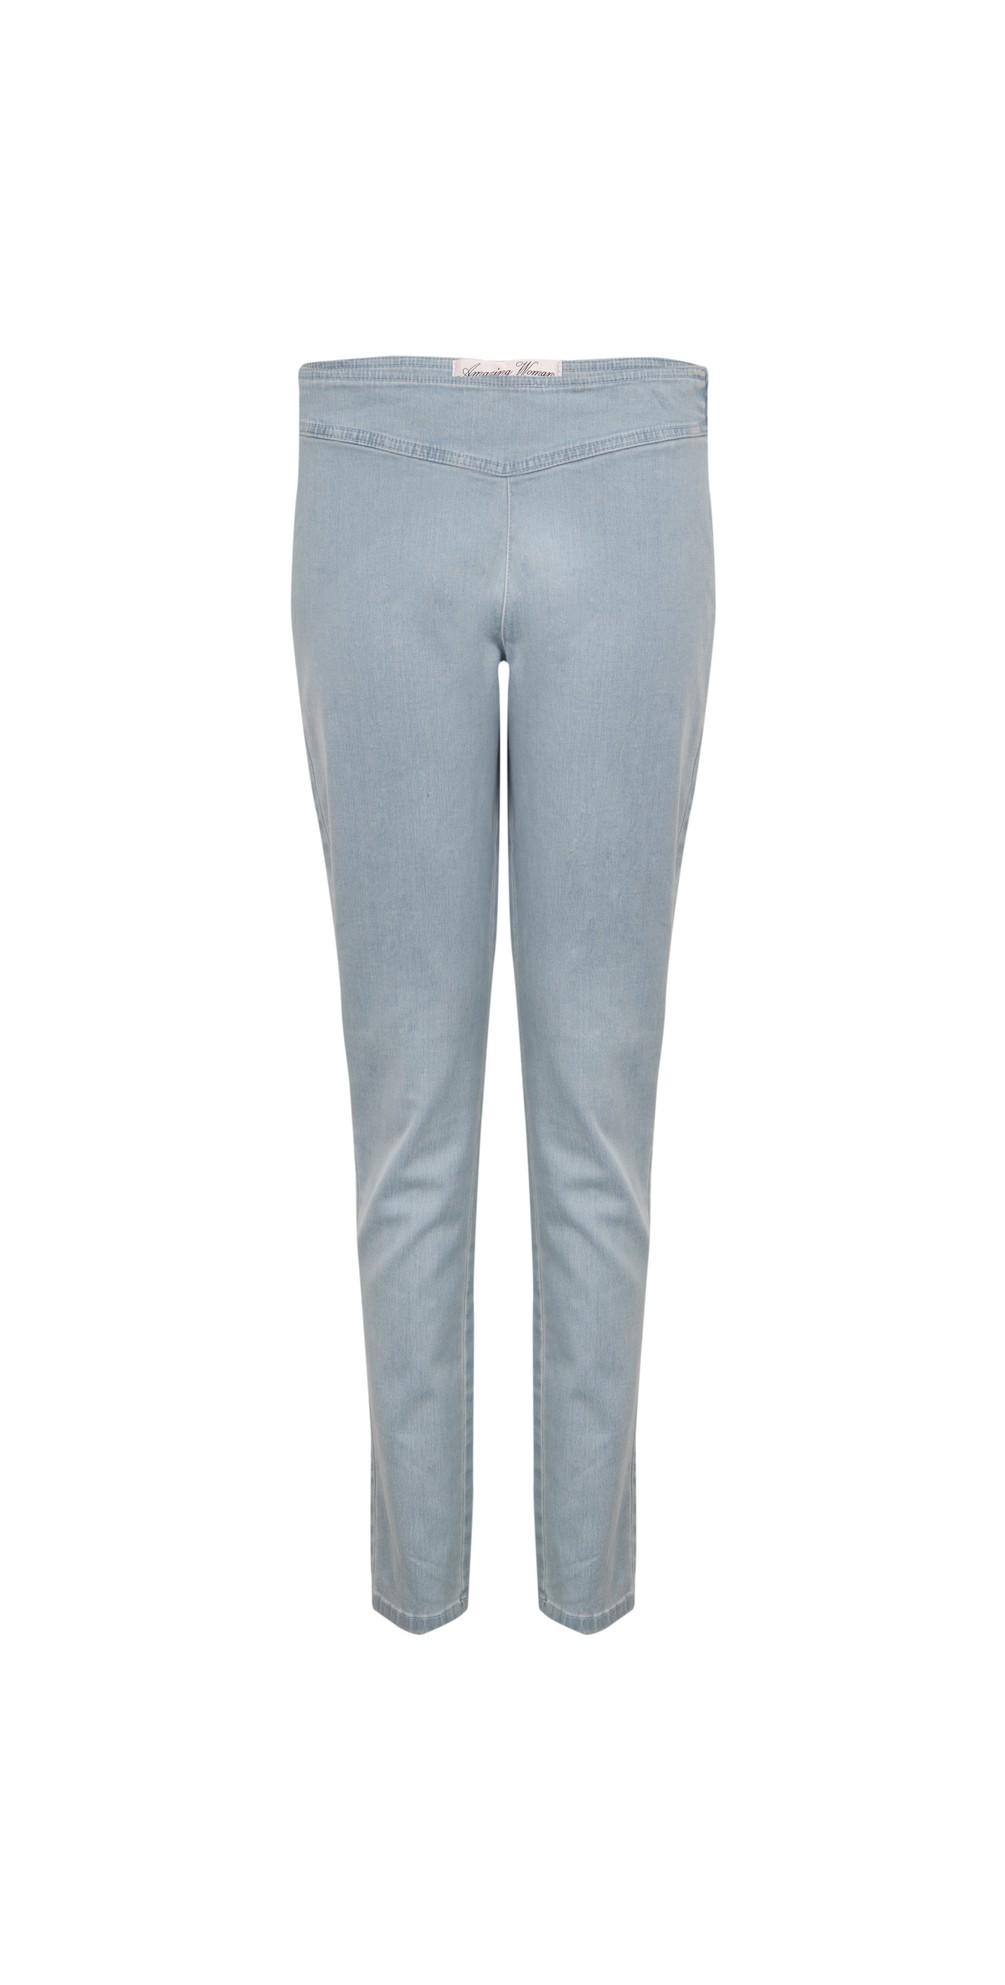 Moonlite 14 Superstretch Skinny Fit Side Zip Jean main image